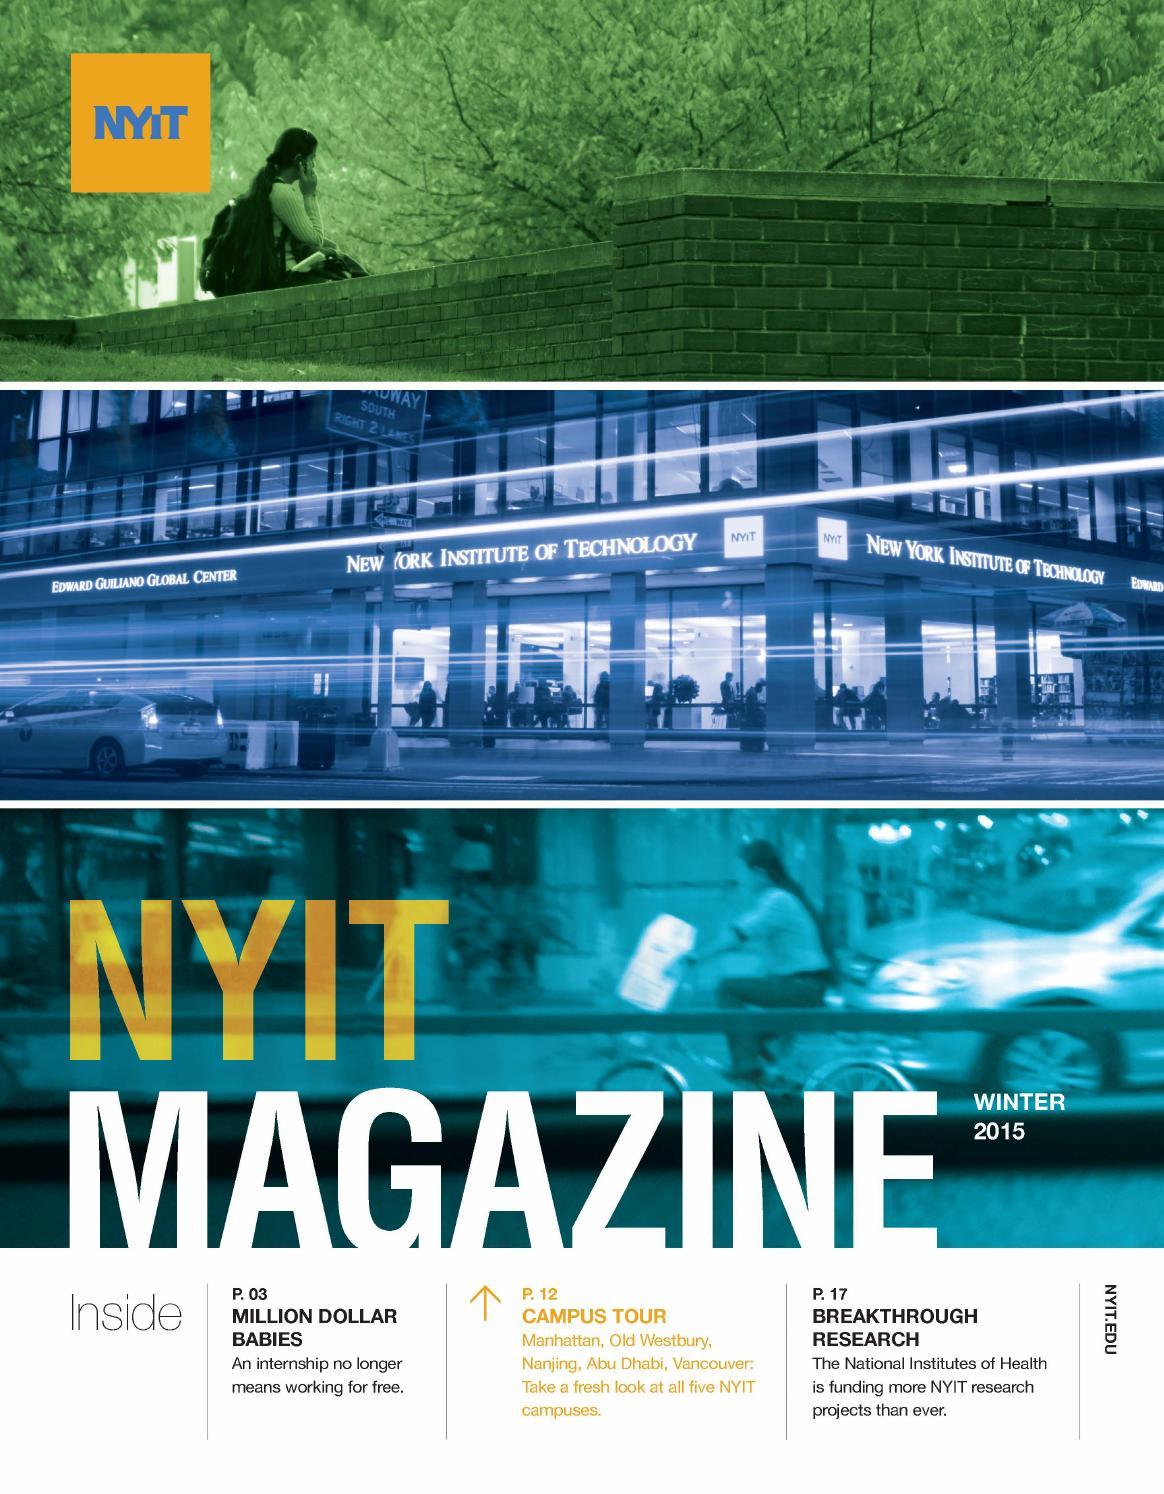 Nyit magazine winter 2015 by nyit magazine issuu fandeluxe Gallery